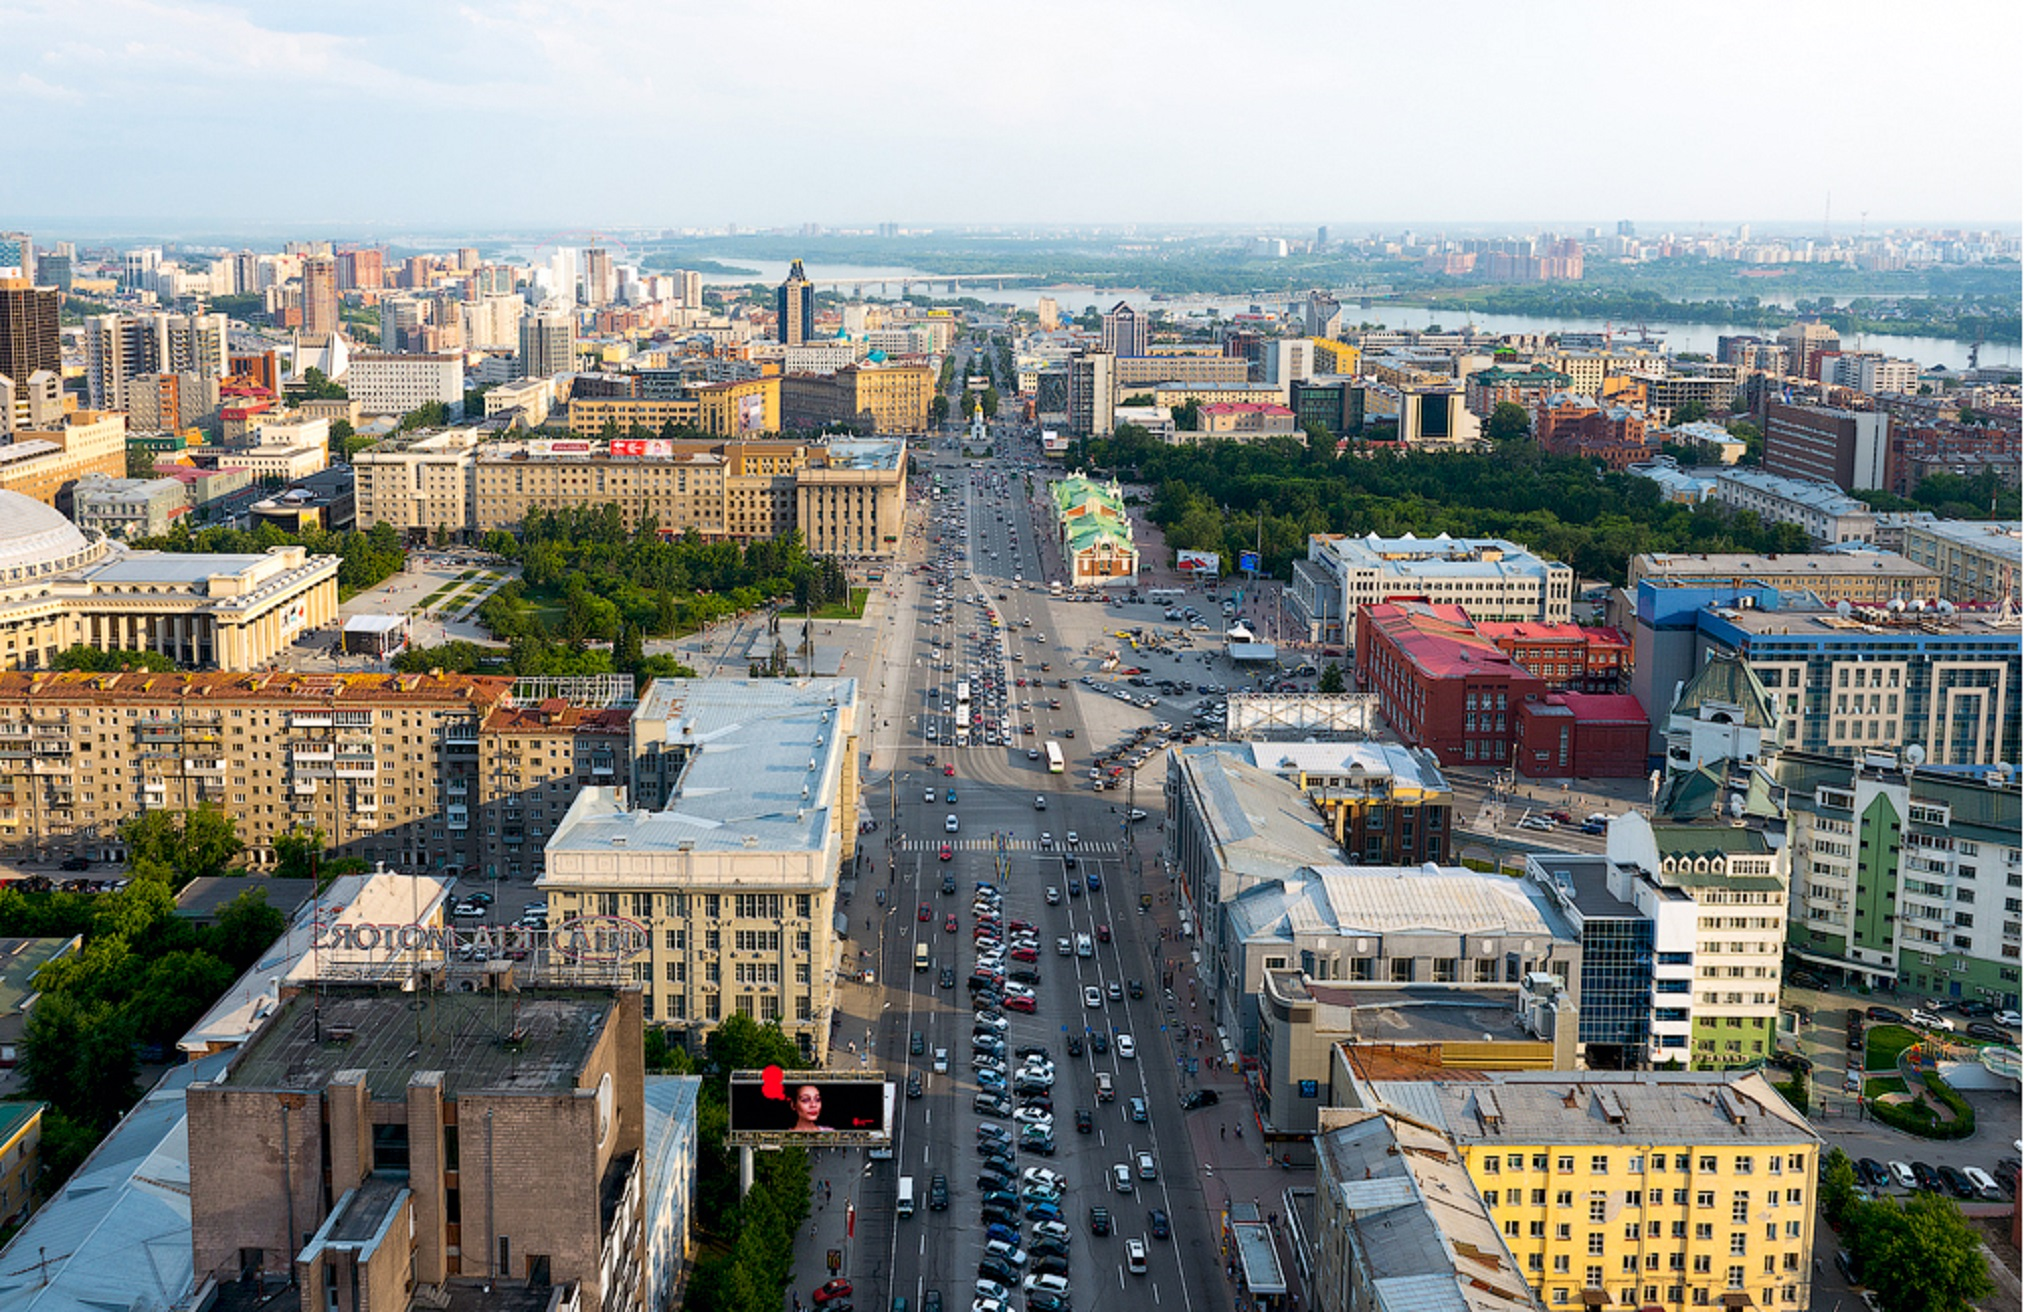 05 - Sibéria capital